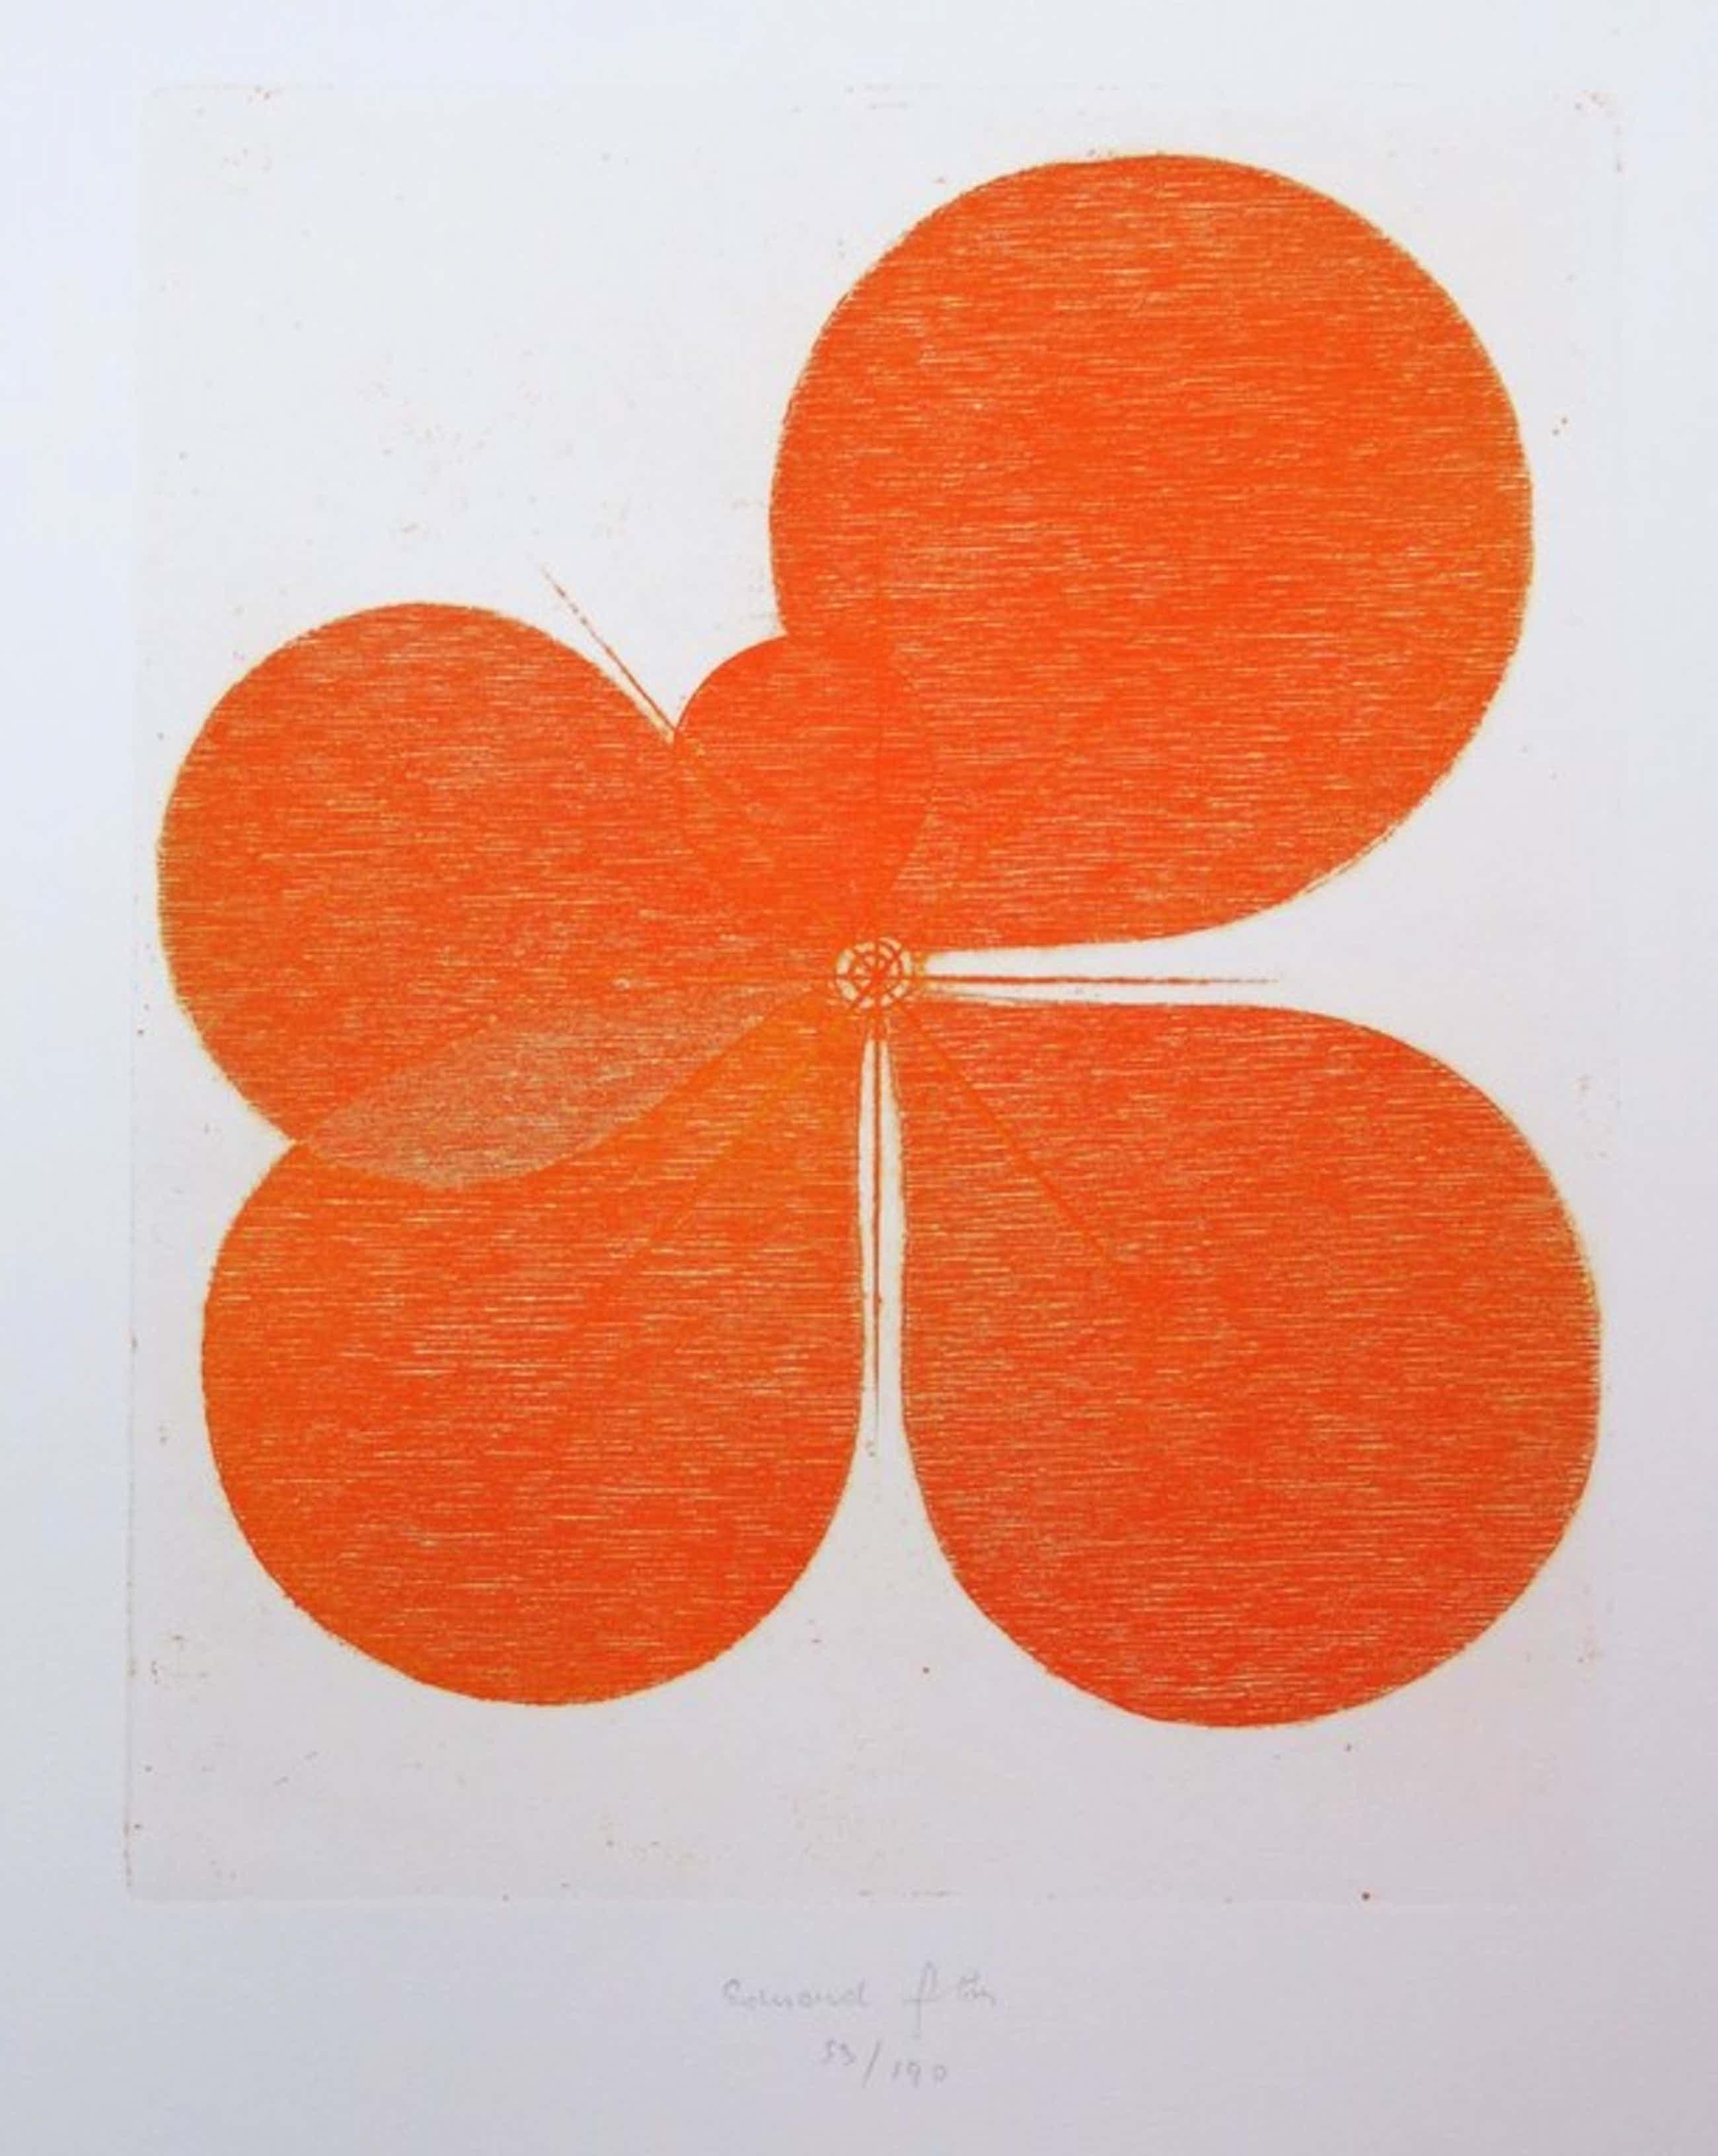 Eduard Flor: Ets, Le printemps oranje kopen? Bied vanaf 35!